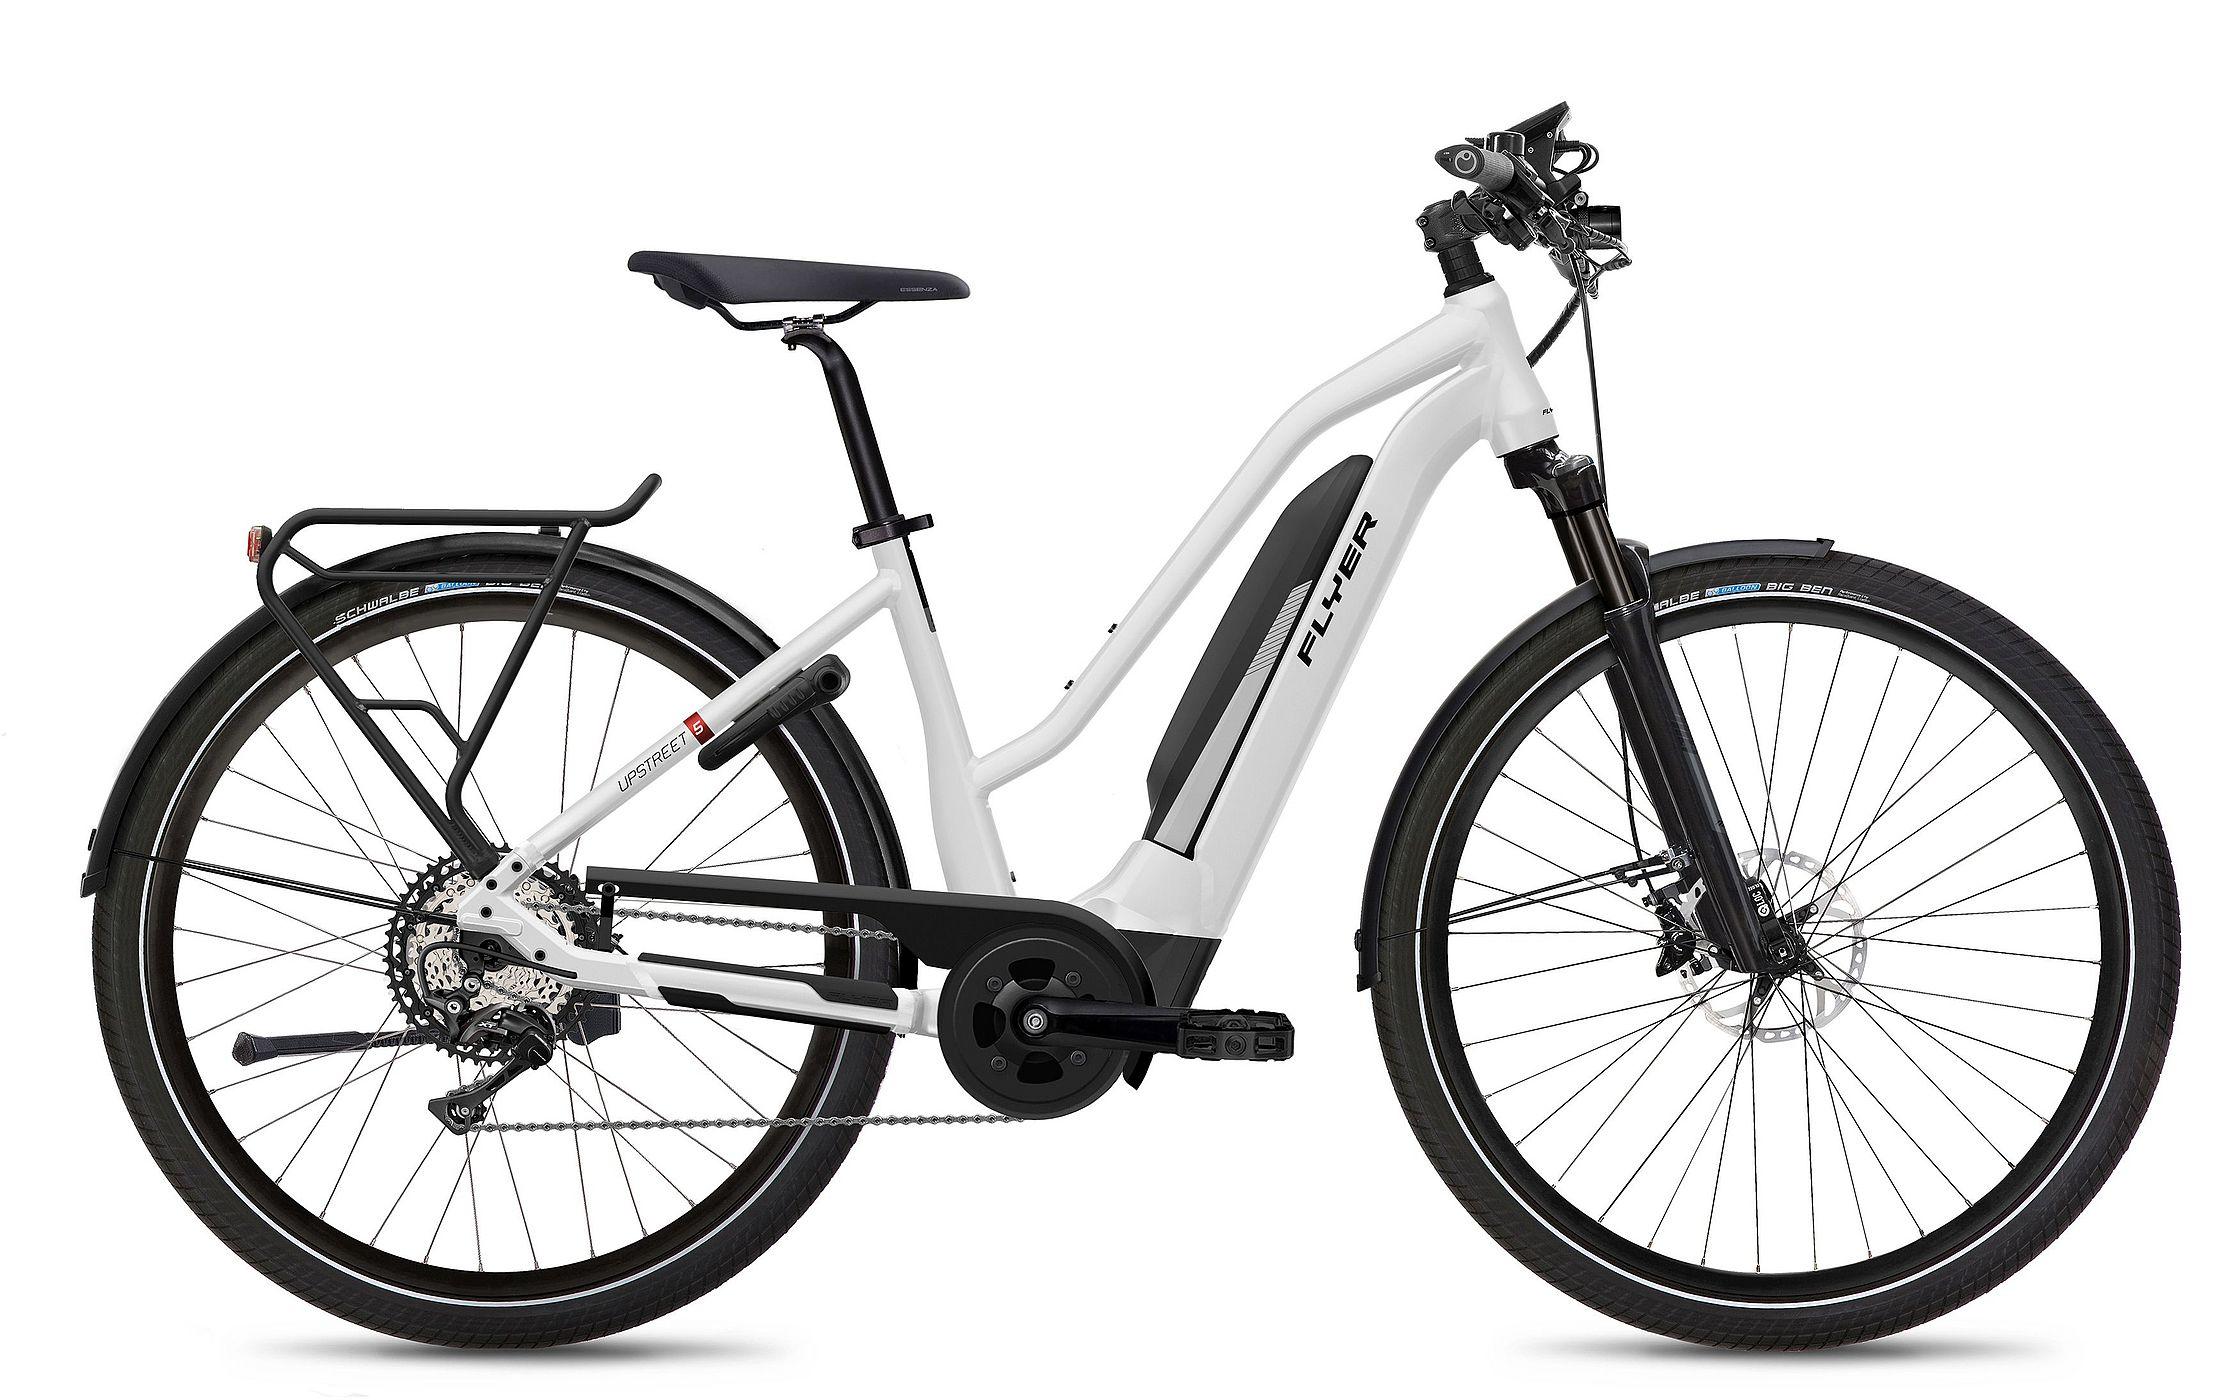 FLYER_E-Bikes_MY21_Upstreet5_770_Mixed_D1_PearlWhiteGloss